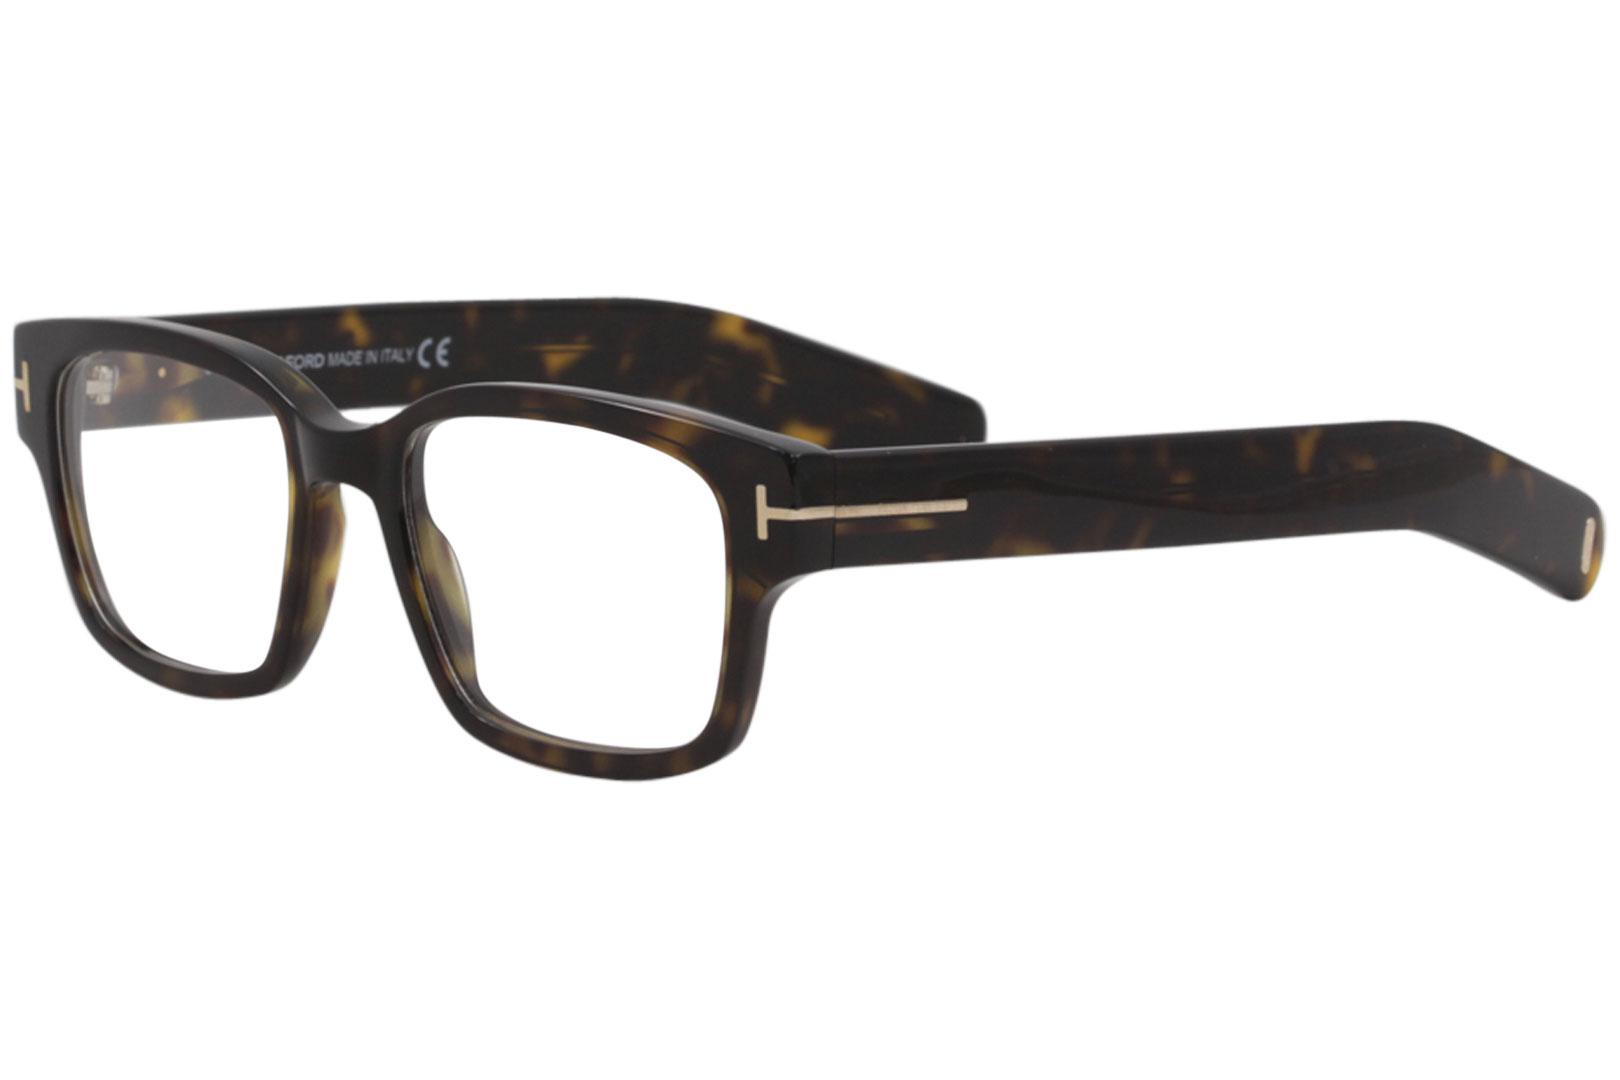 bf757543bd8b Tom Ford Men s Eyeglasses TF5527 TF 5527 Full Rim Optical Frame by Tom Ford